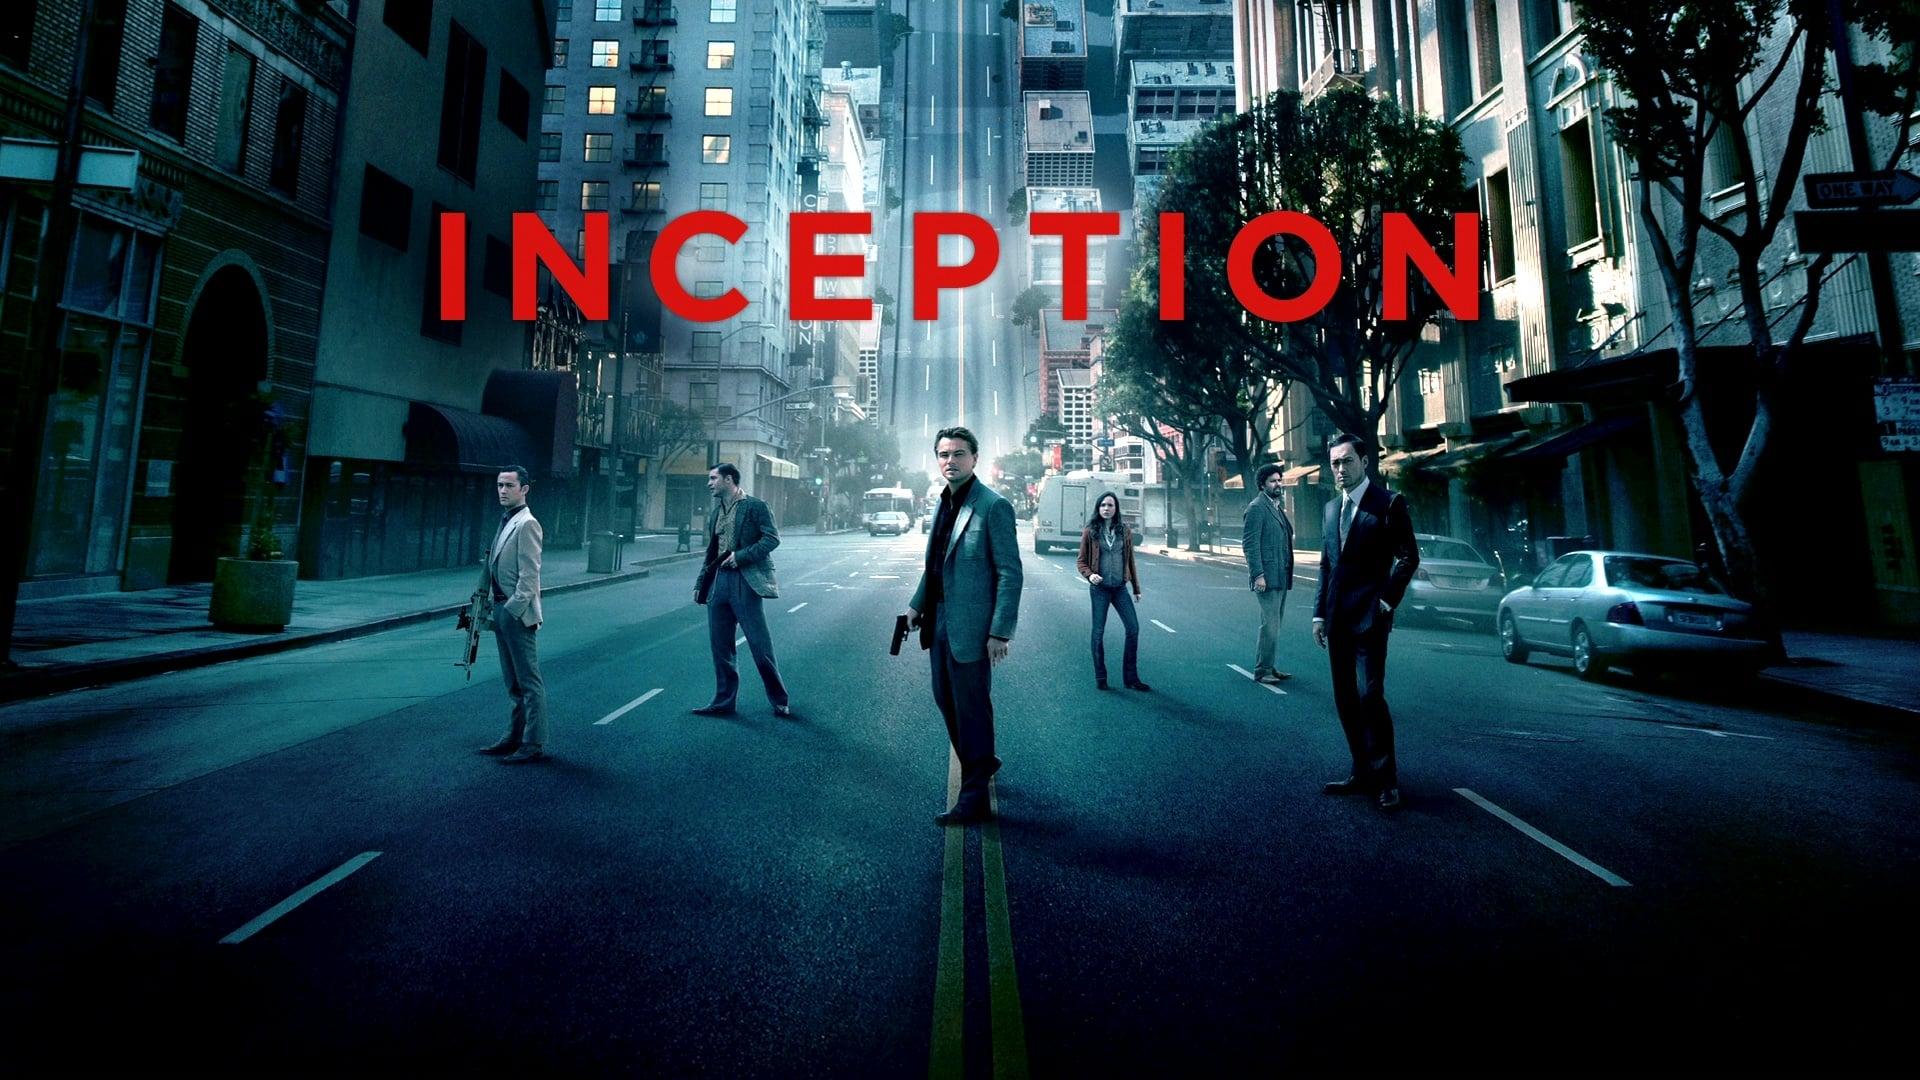 Inception 2010 Az Movies